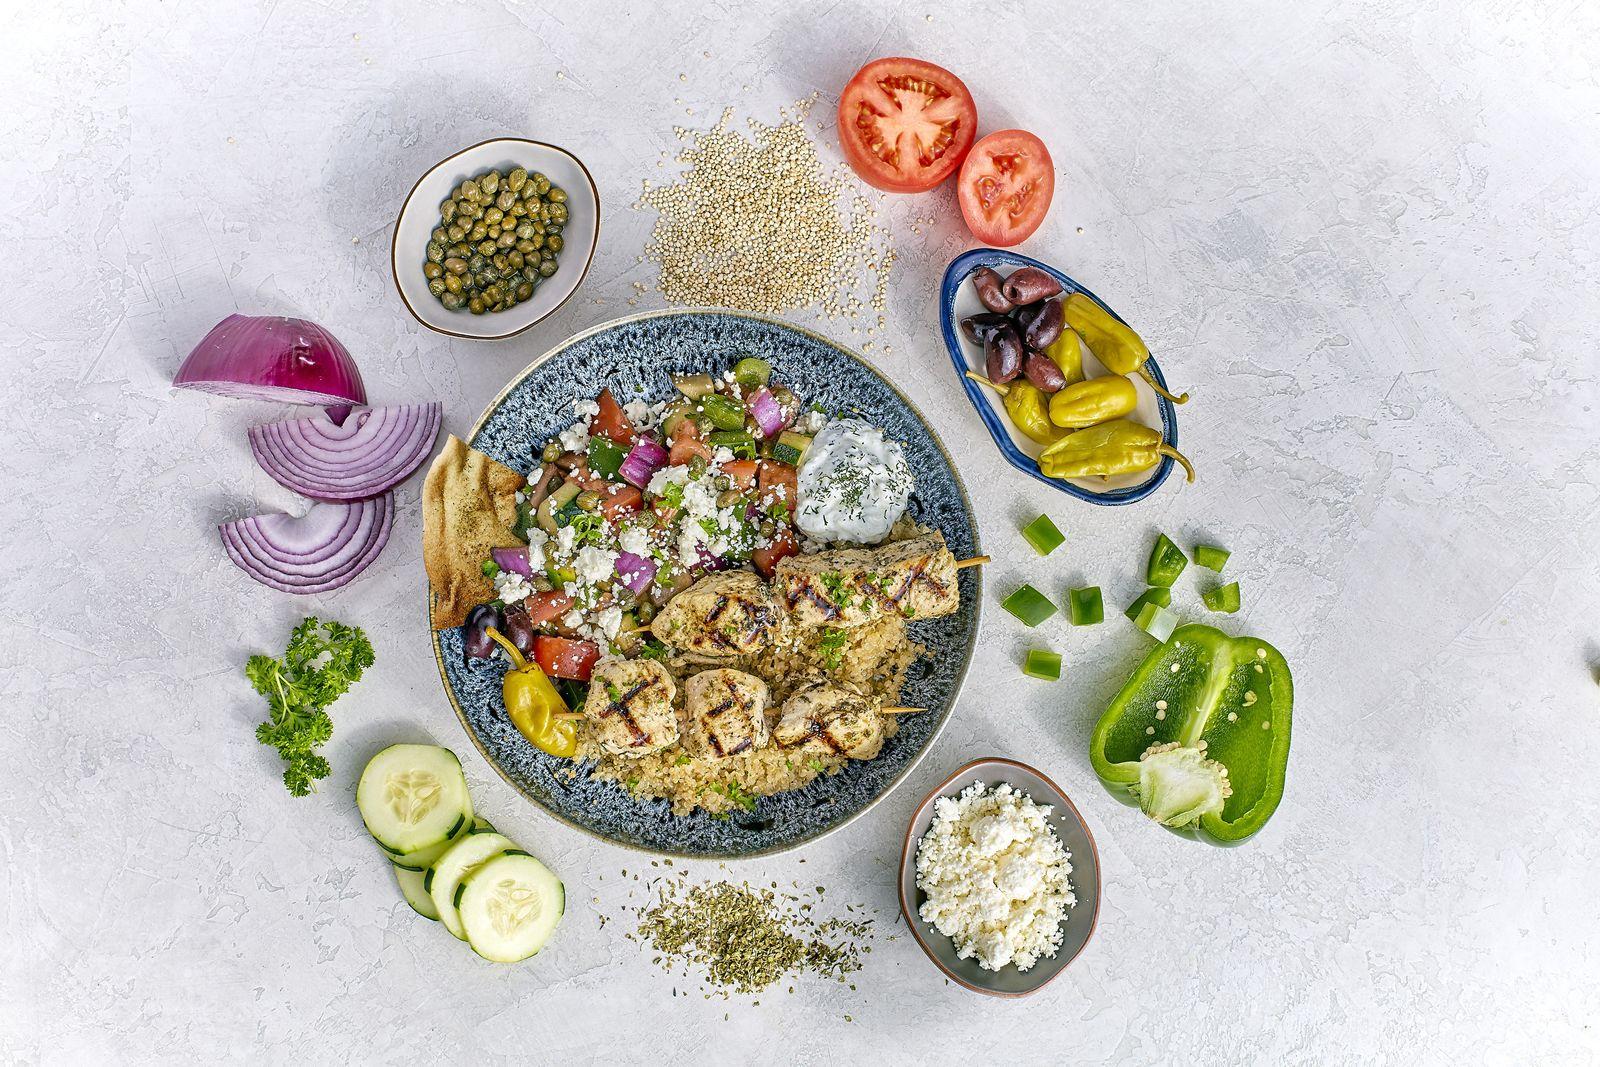 Taziki's Mediterranean Café Adds New Spring Menu Item